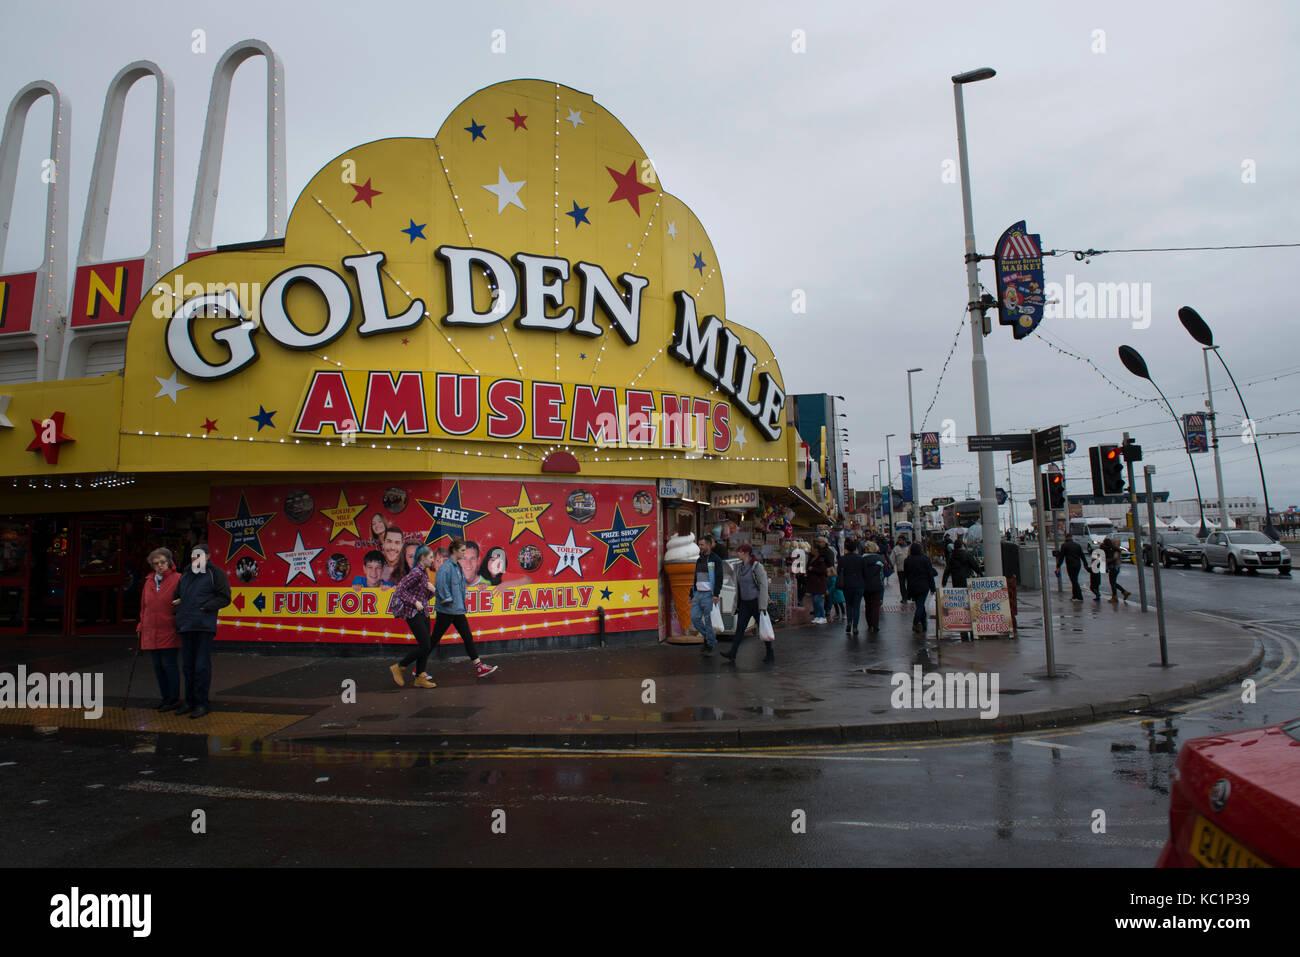 Blackpool Golden Mile Amusements arcade. Lancashire credit, LEE RAMSDEN / ALAMY - Stock Image